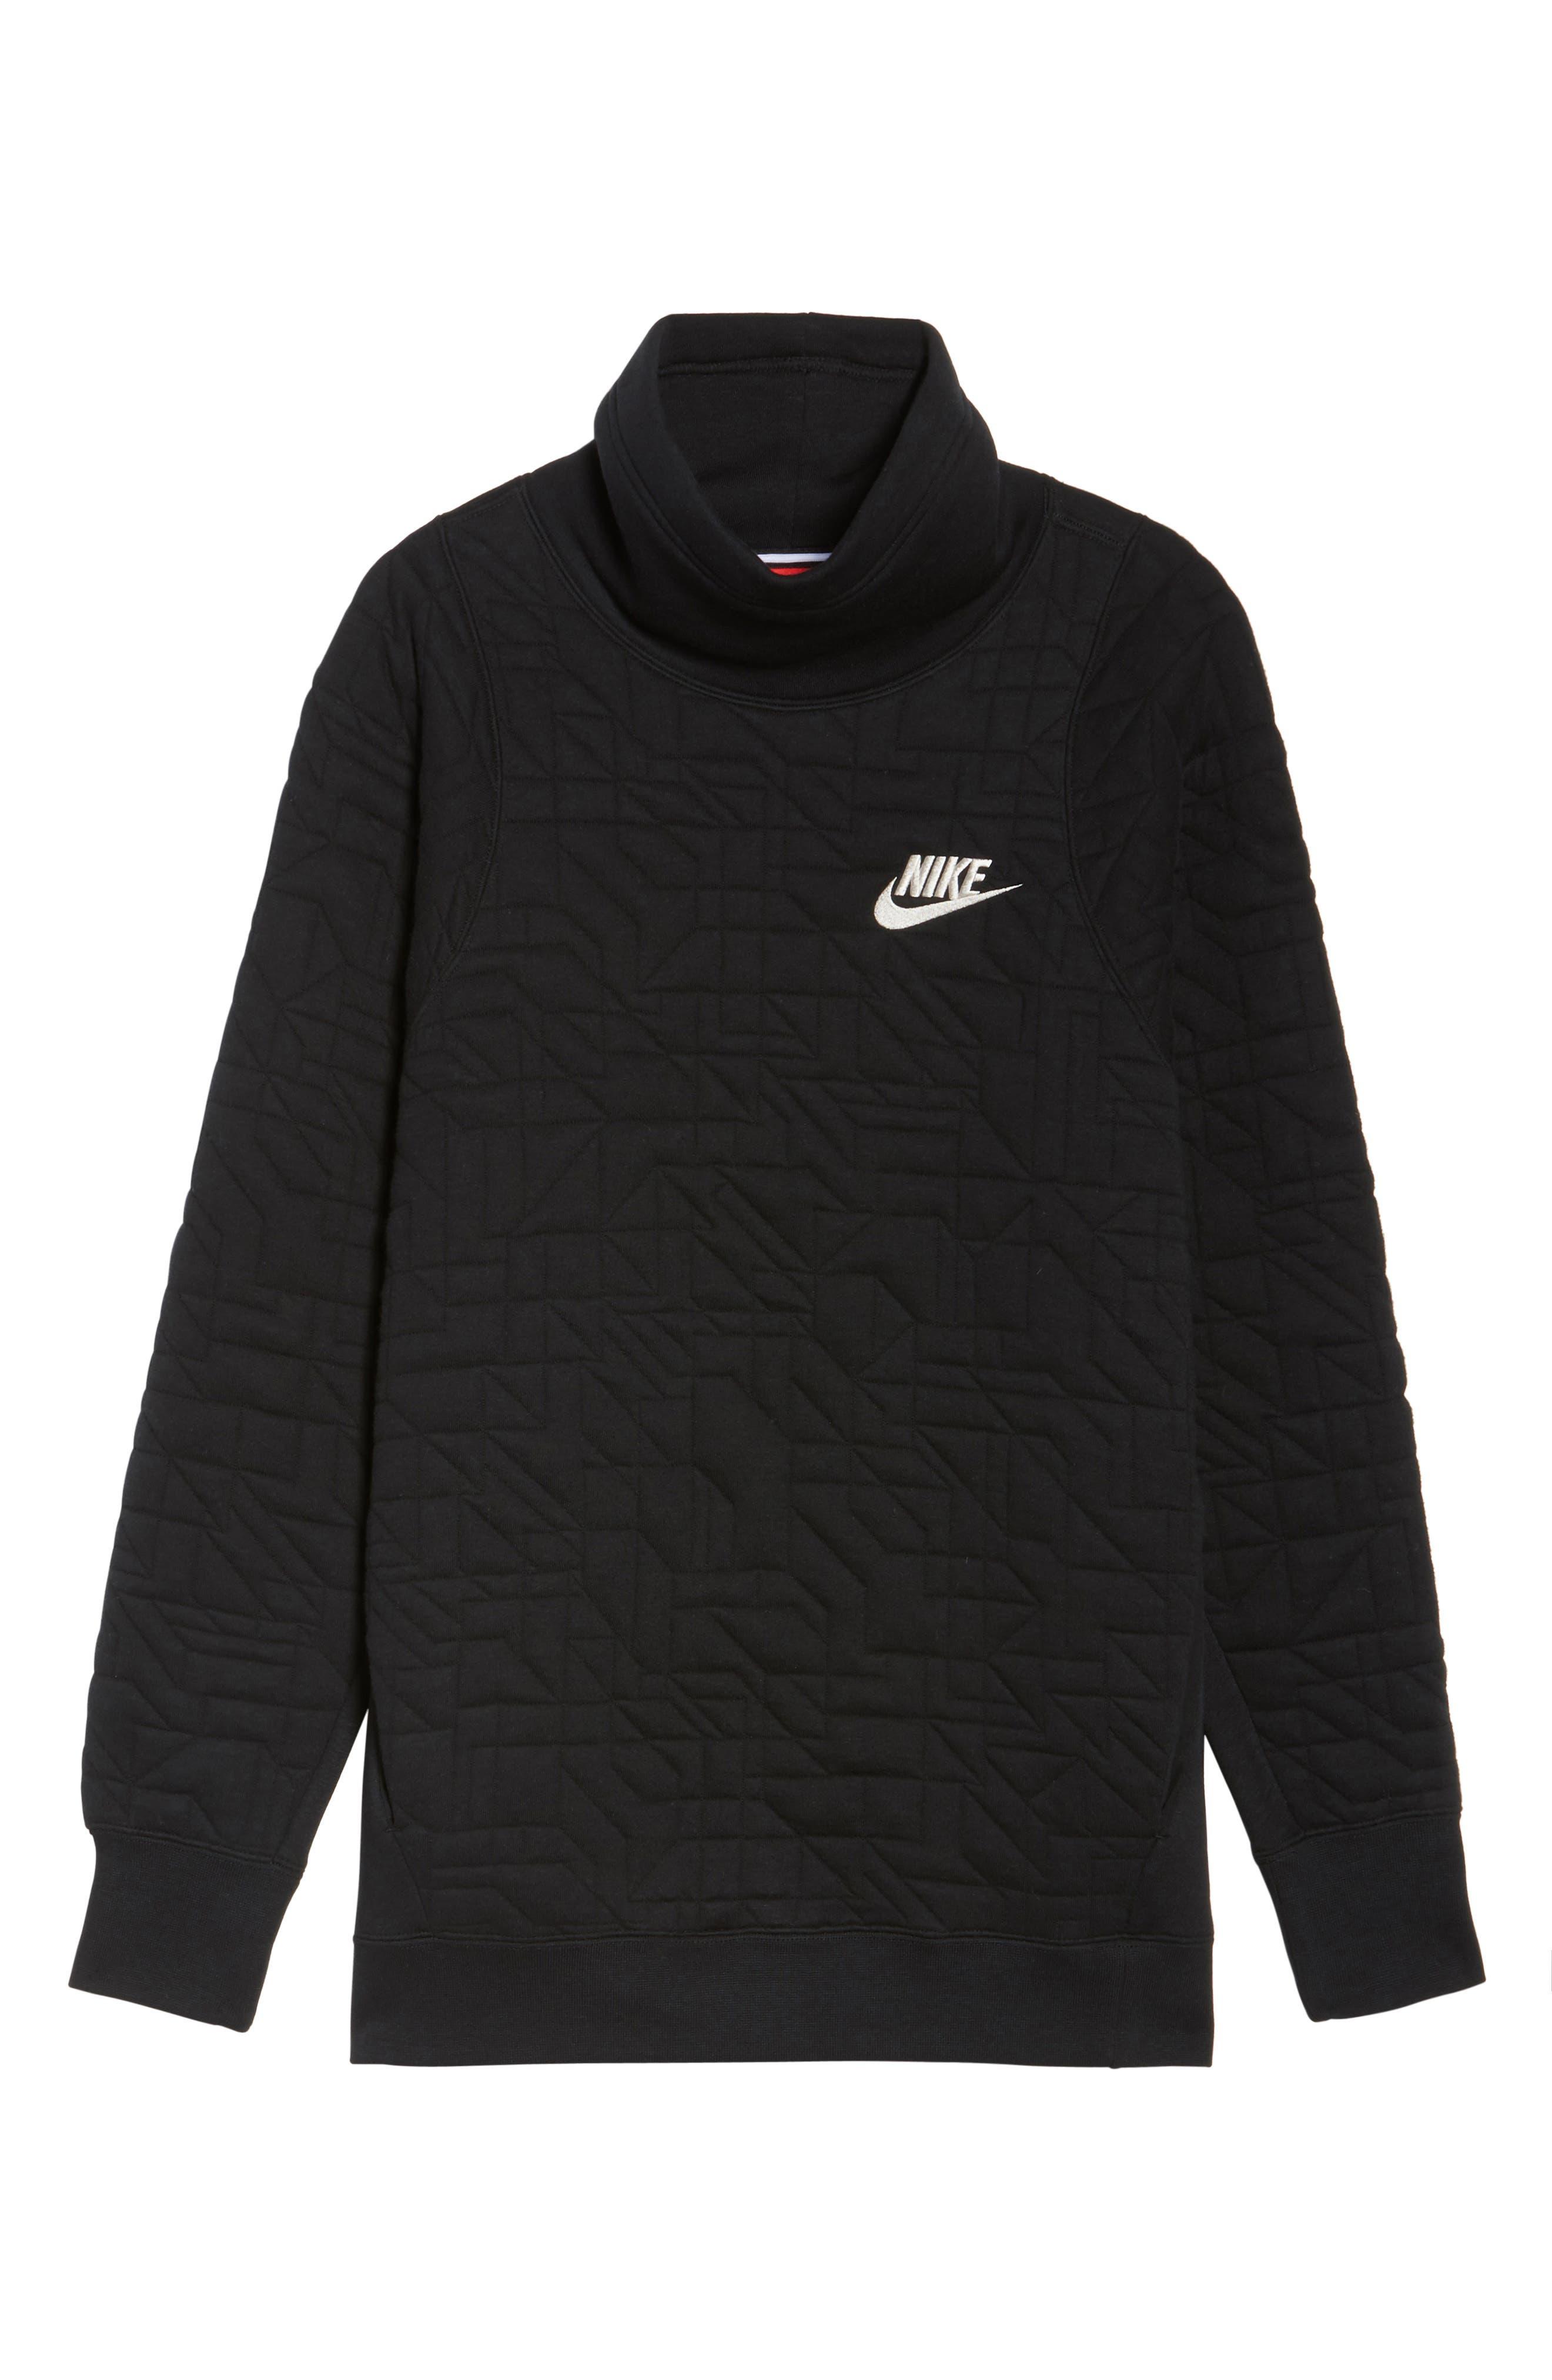 Sportswear Quilted Funnel Neck Pullover,                             Alternate thumbnail 7, color,                             Black/ Light Bone